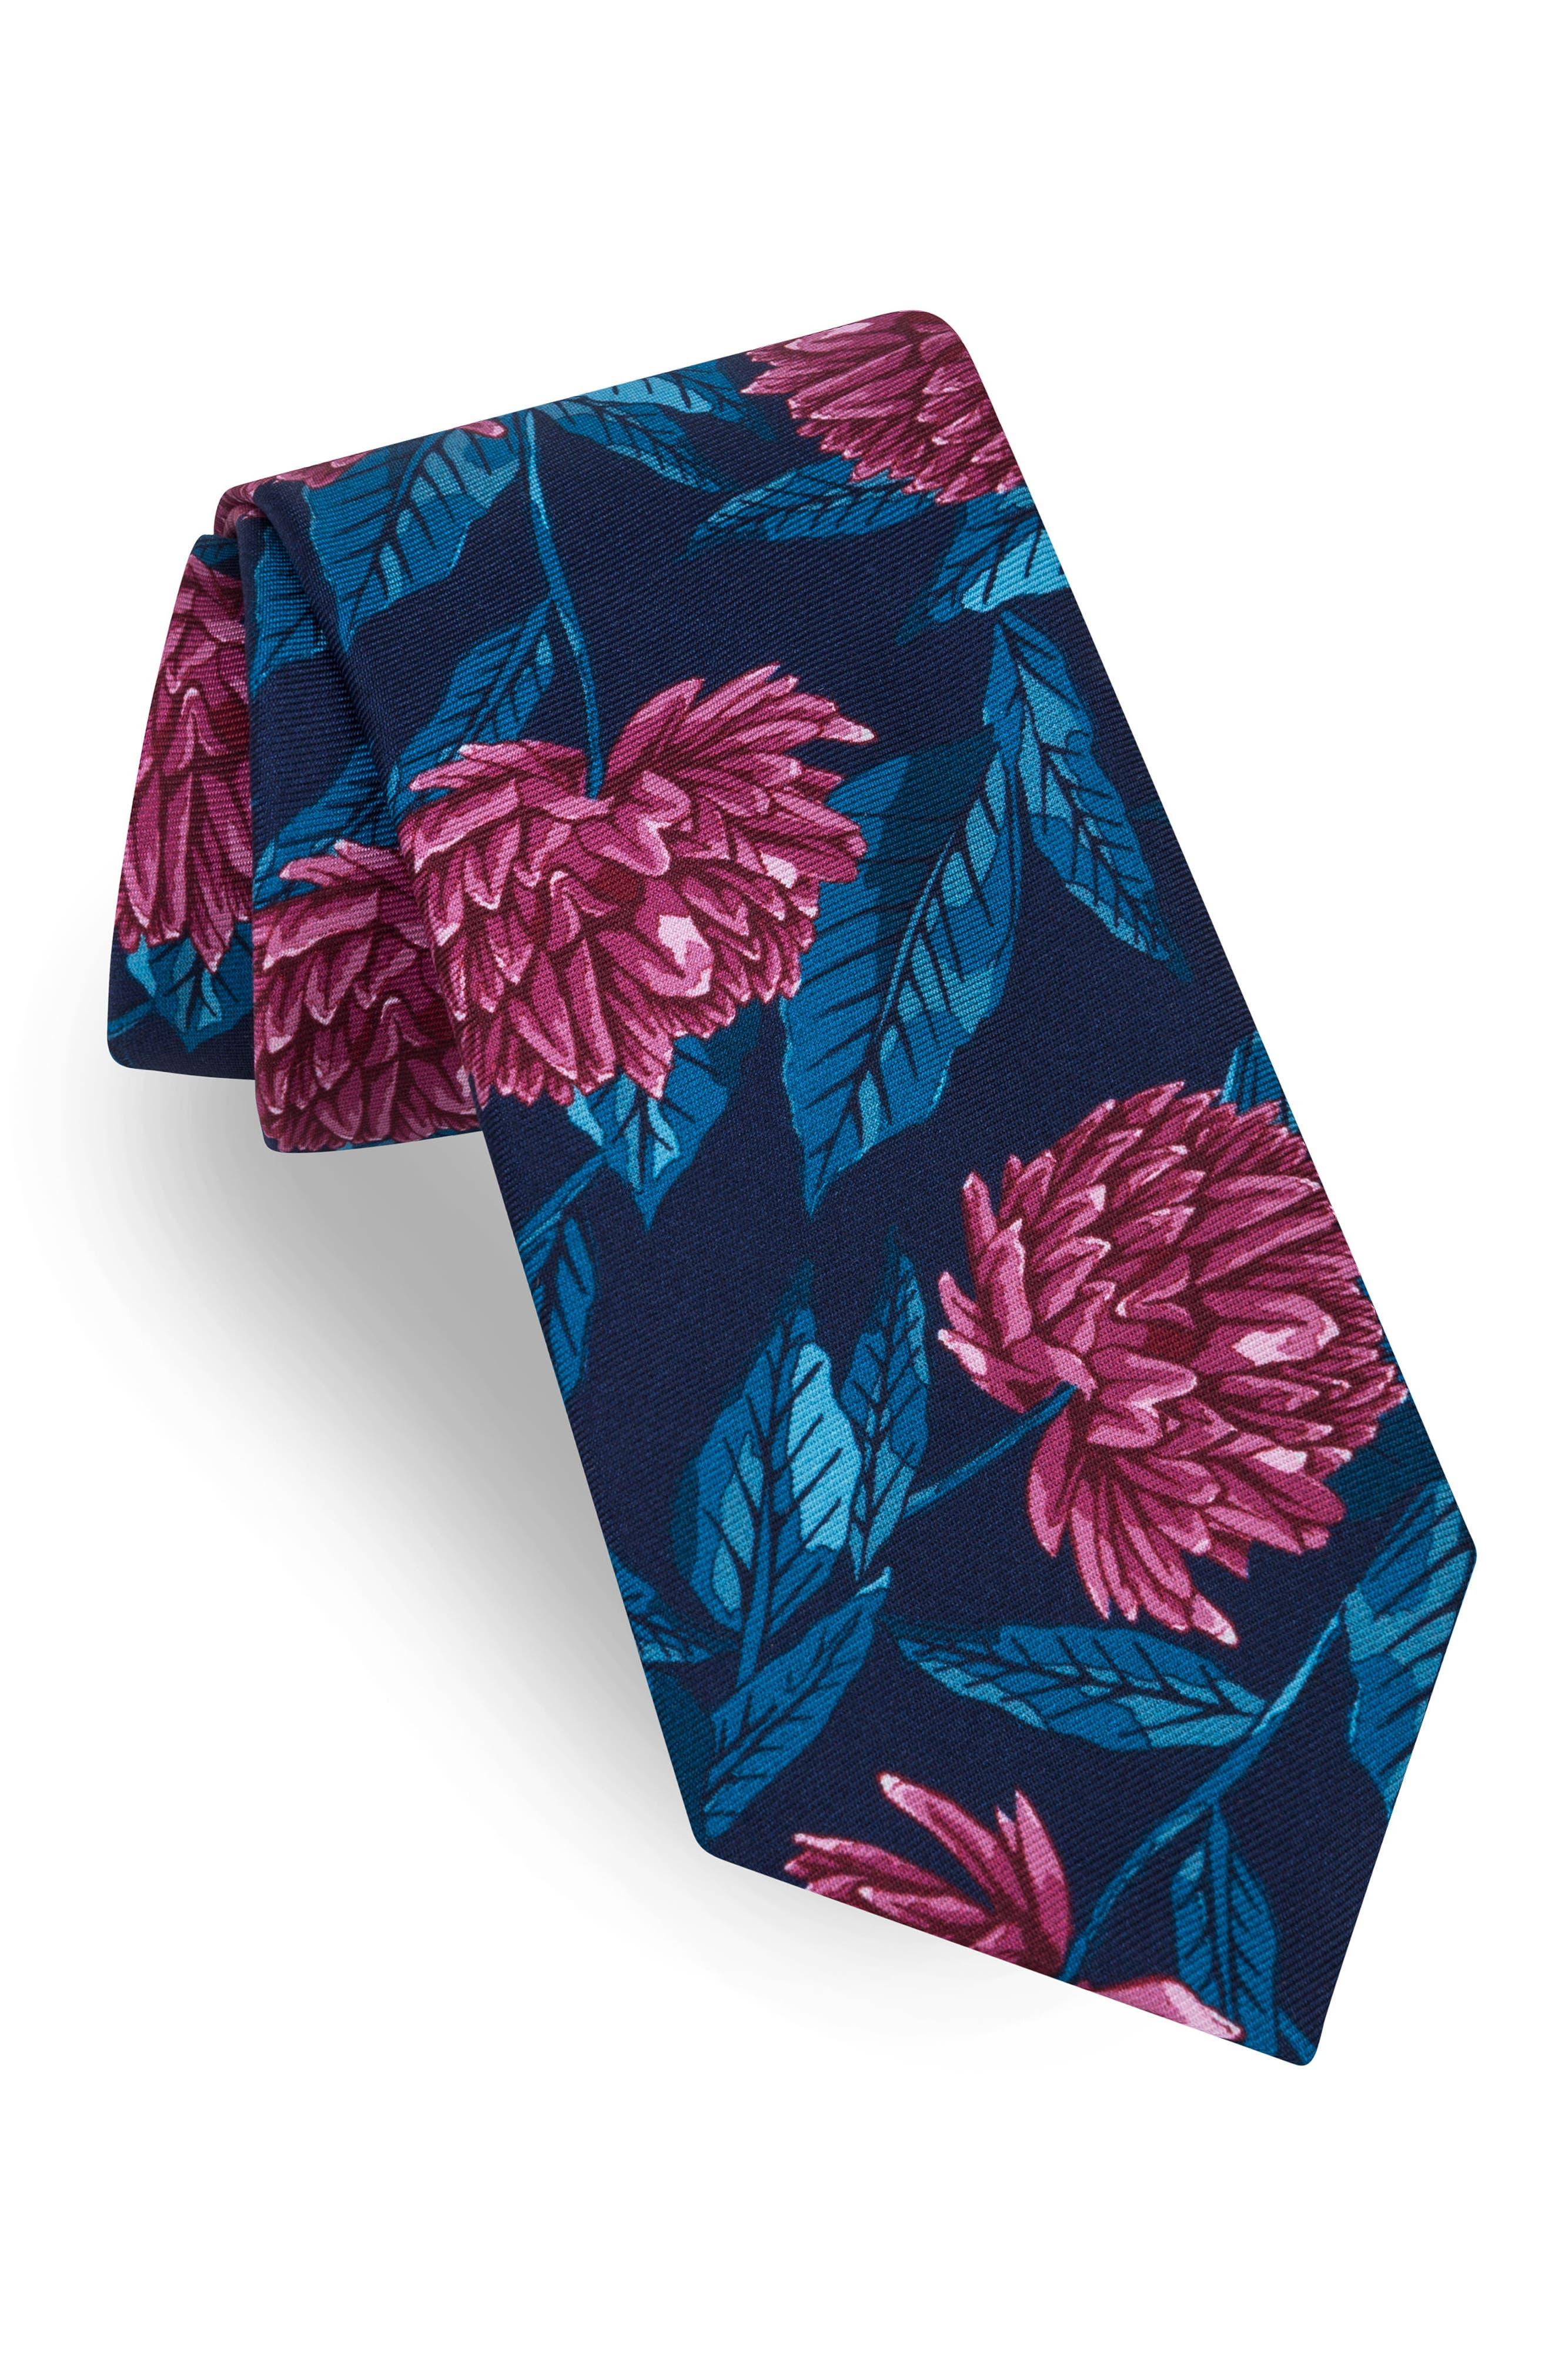 Oversize Flower Tie,                         Main,                         color,